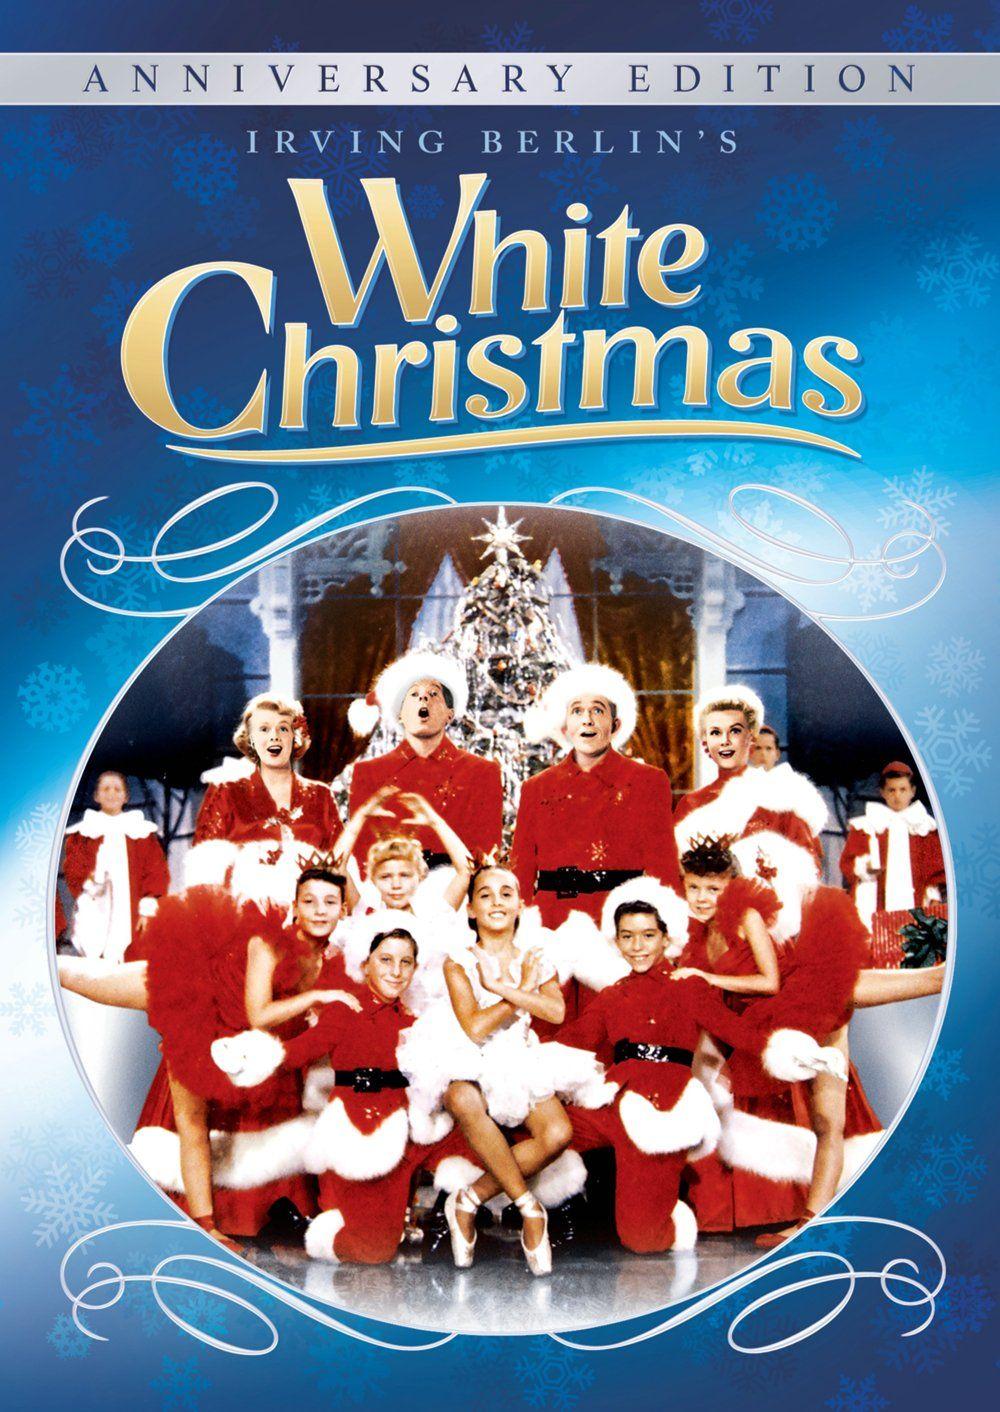 white christmas anniversary edition - Where Was White Christmas Filmed